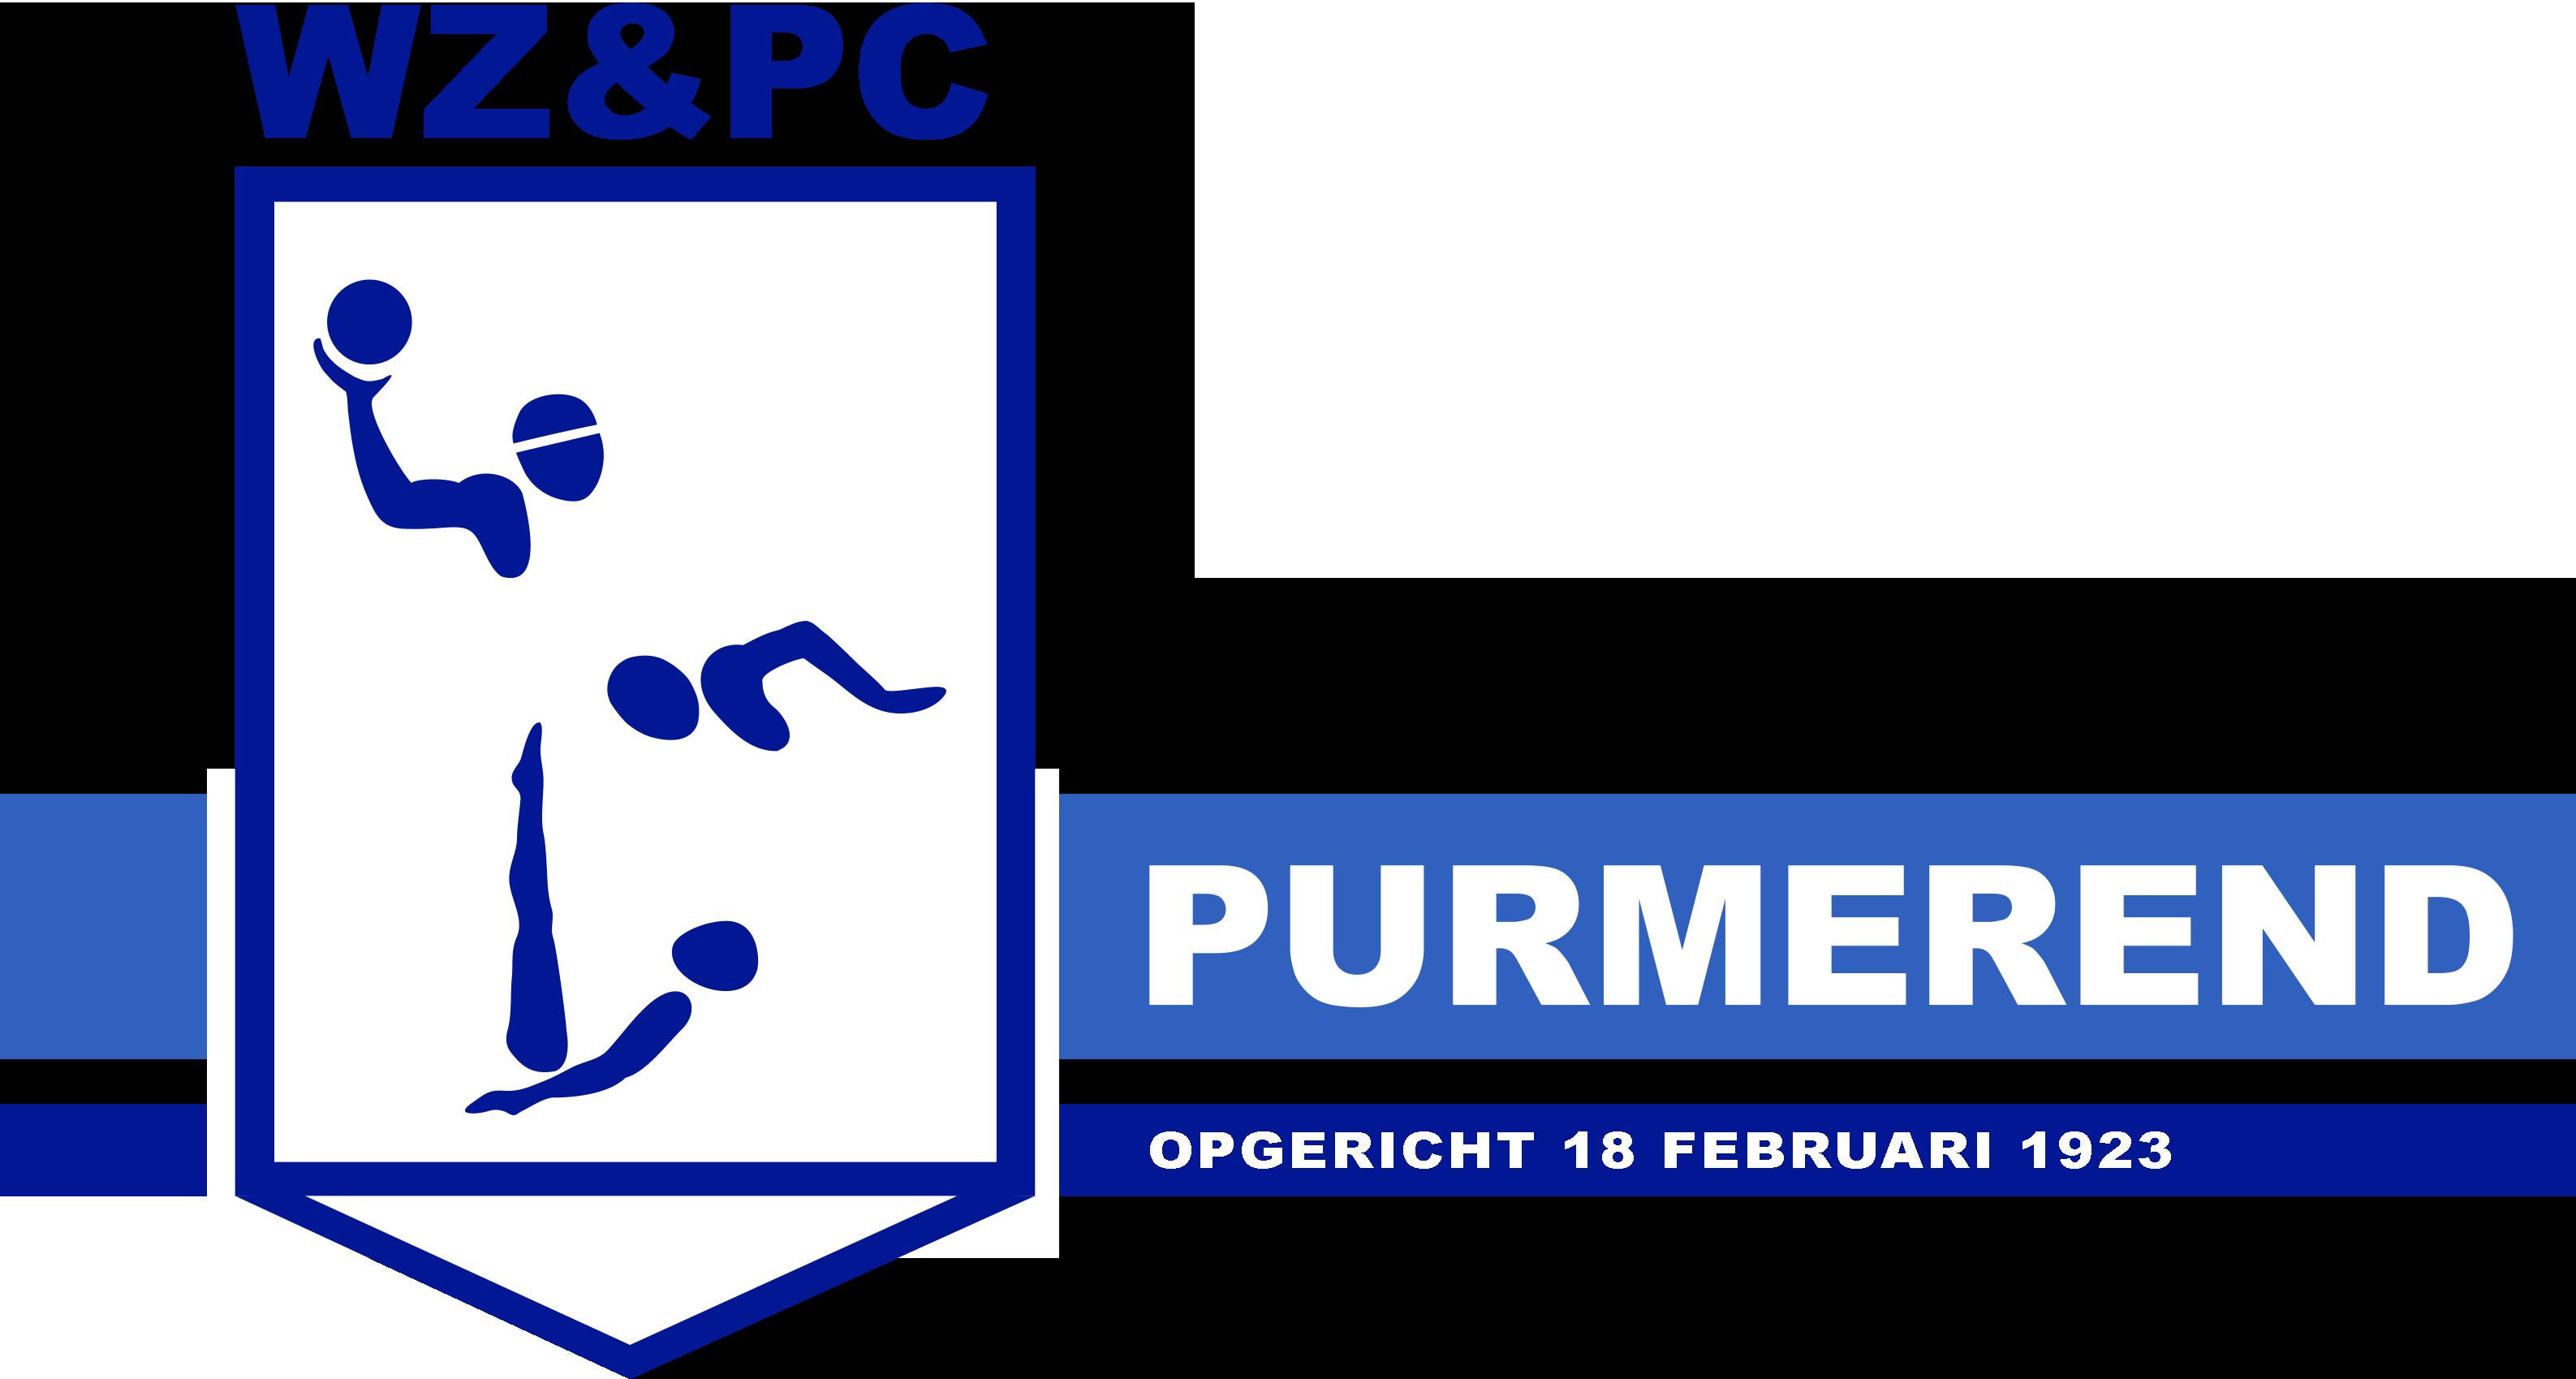 https://wzpc.nl/wp-content/uploads/2019/12/Logo_WZPC-1923.png